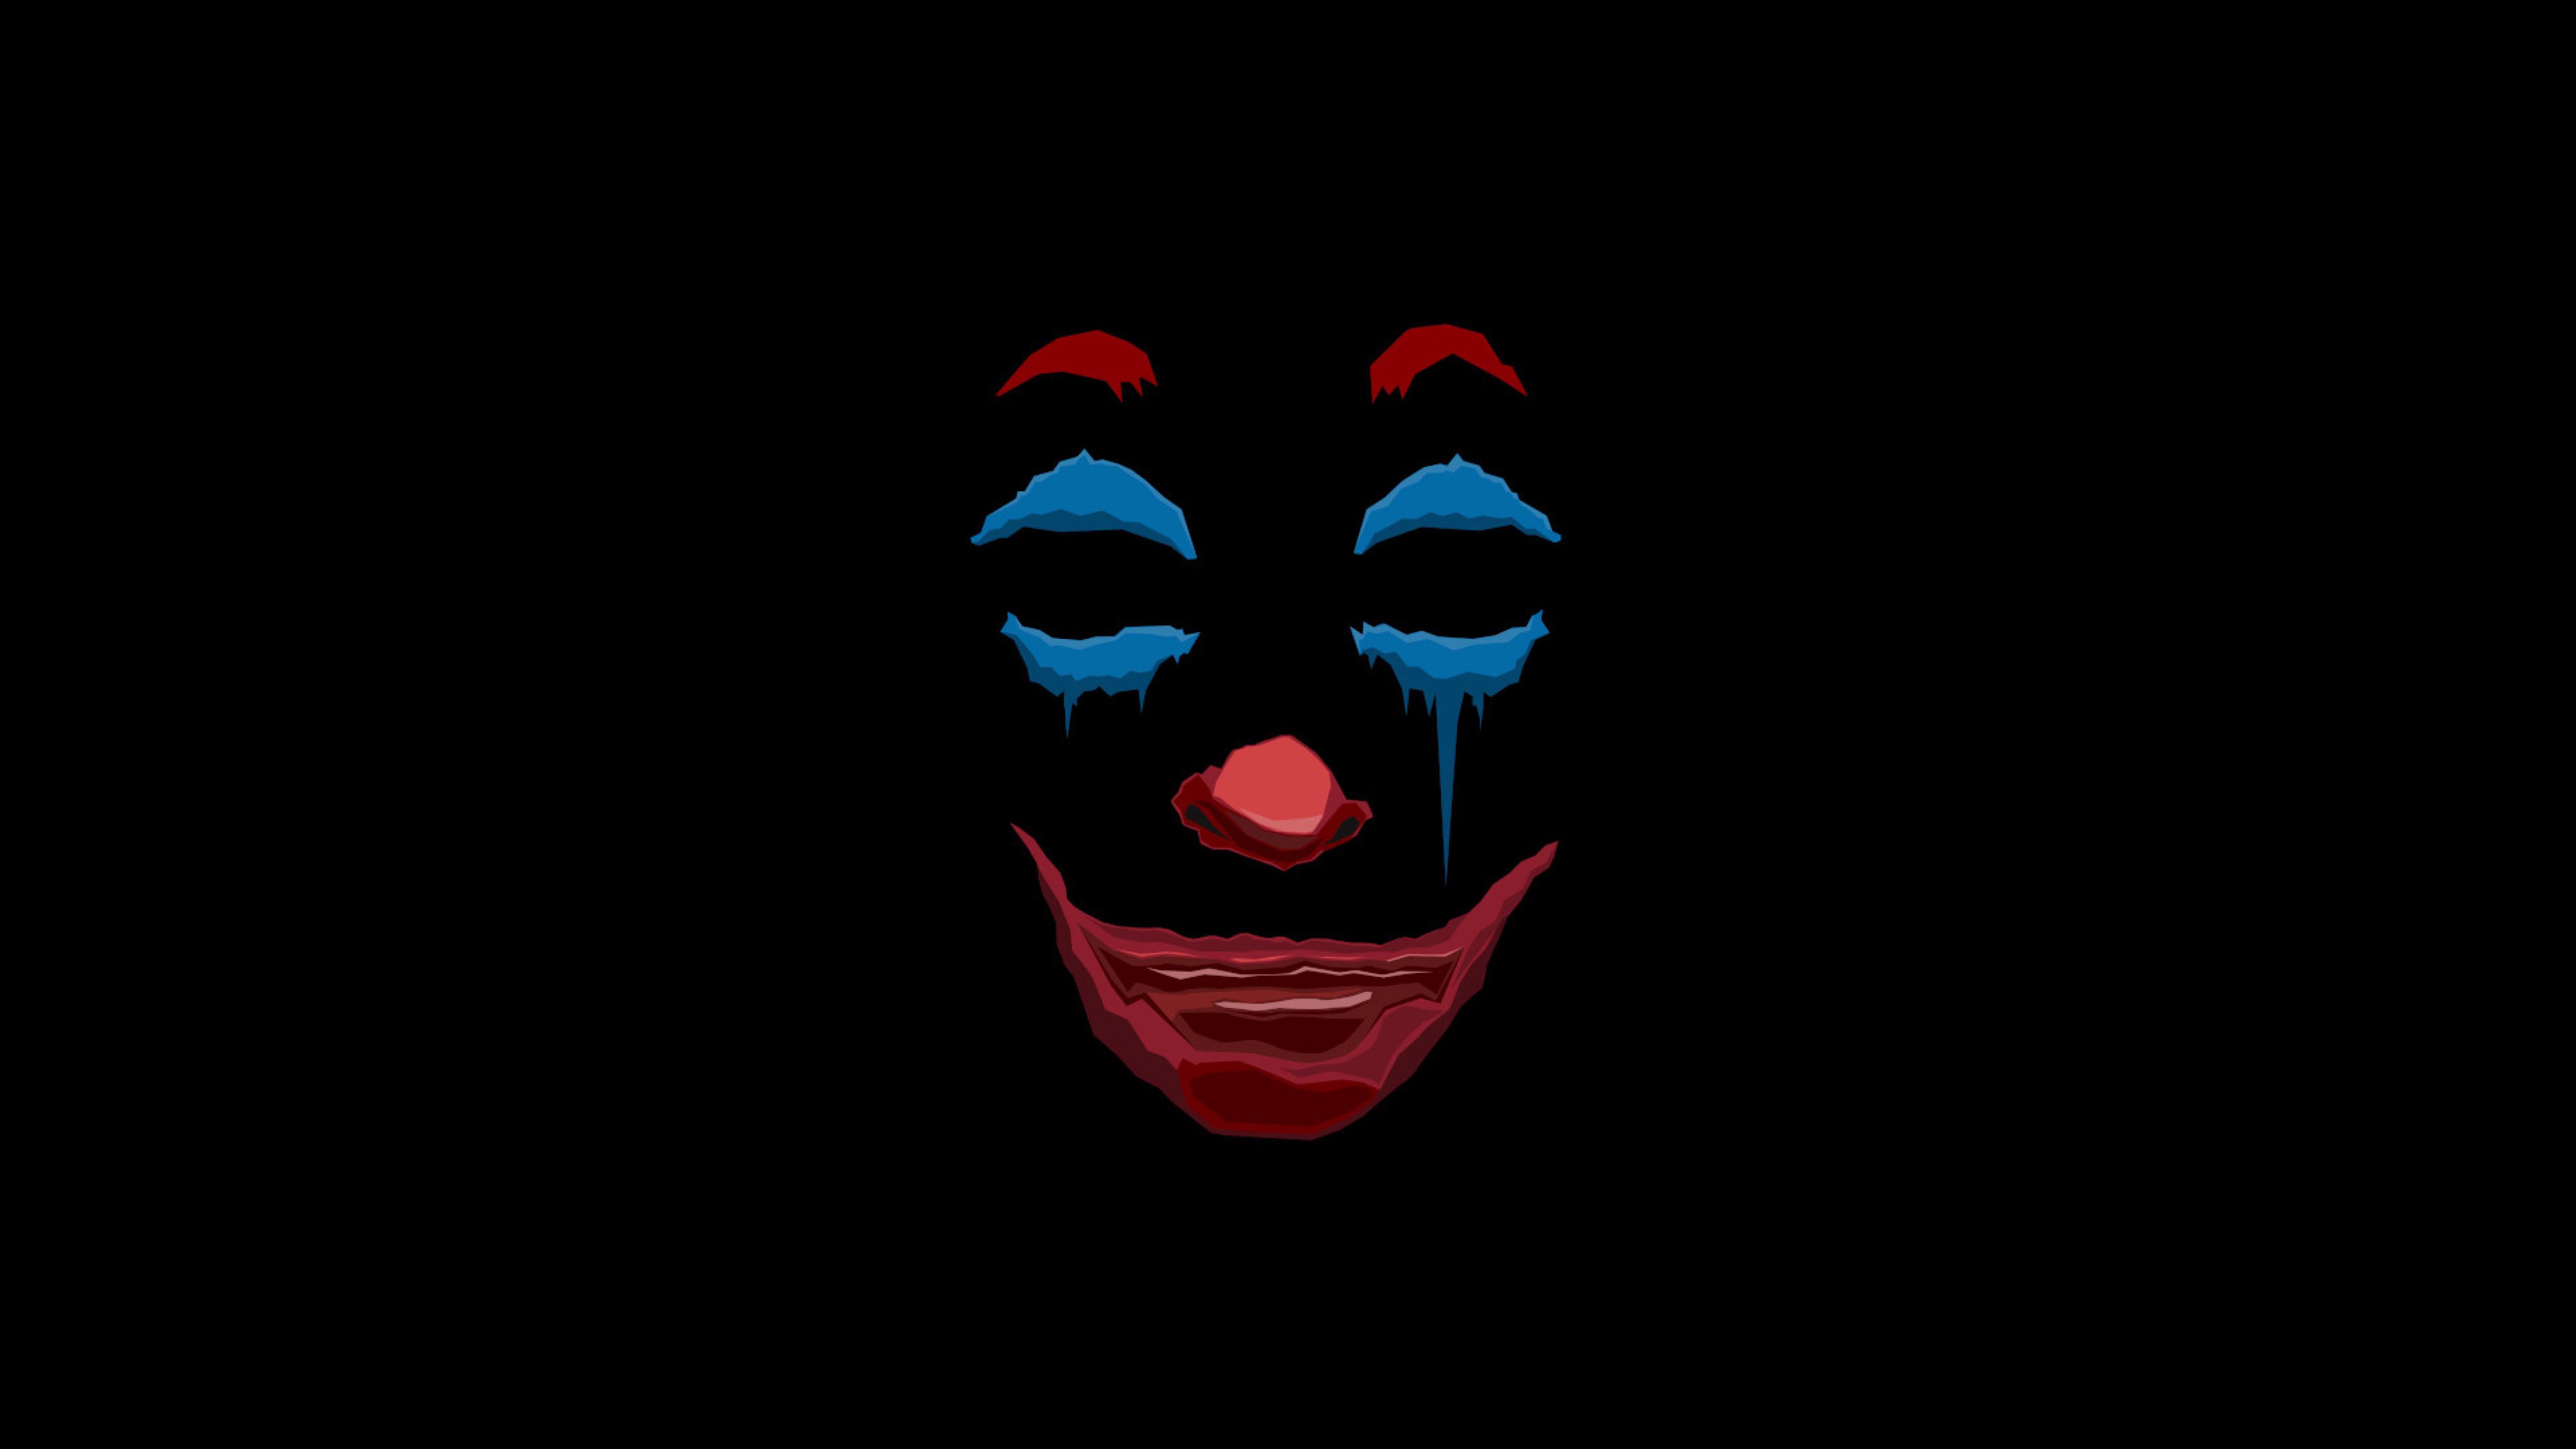 Joker Amoled Wallpaper 4K : Free Download Joker 5k Retina ...